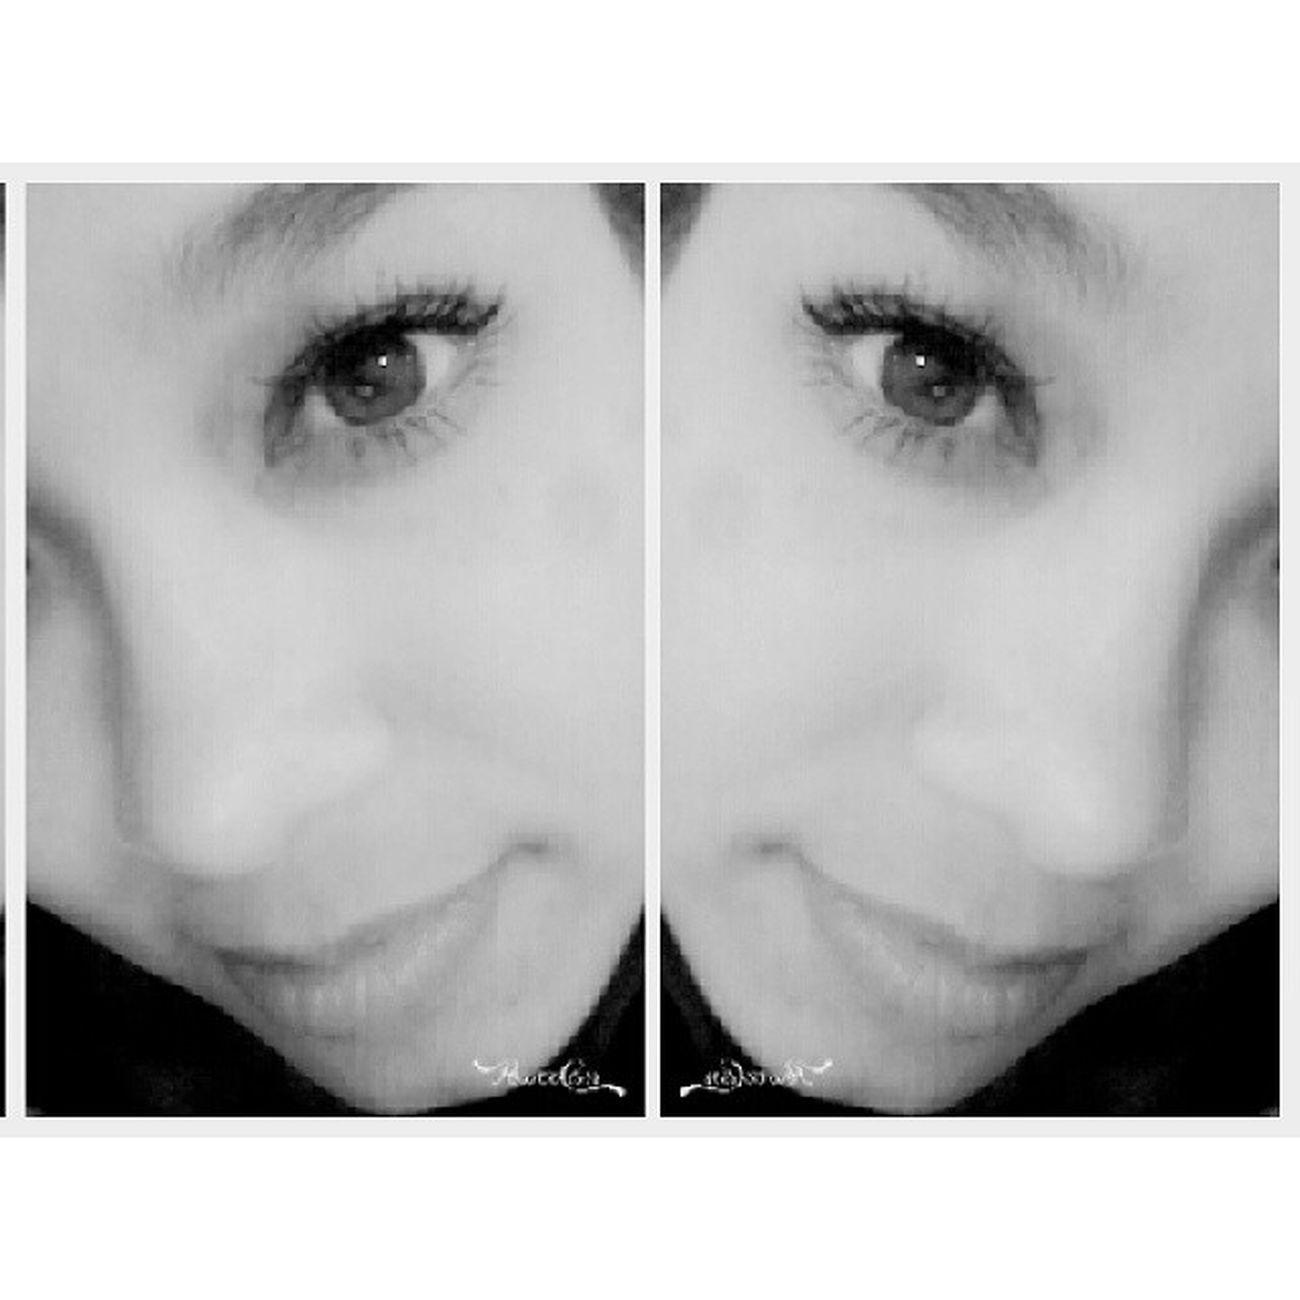 Bored Eyesvain Jelitzha